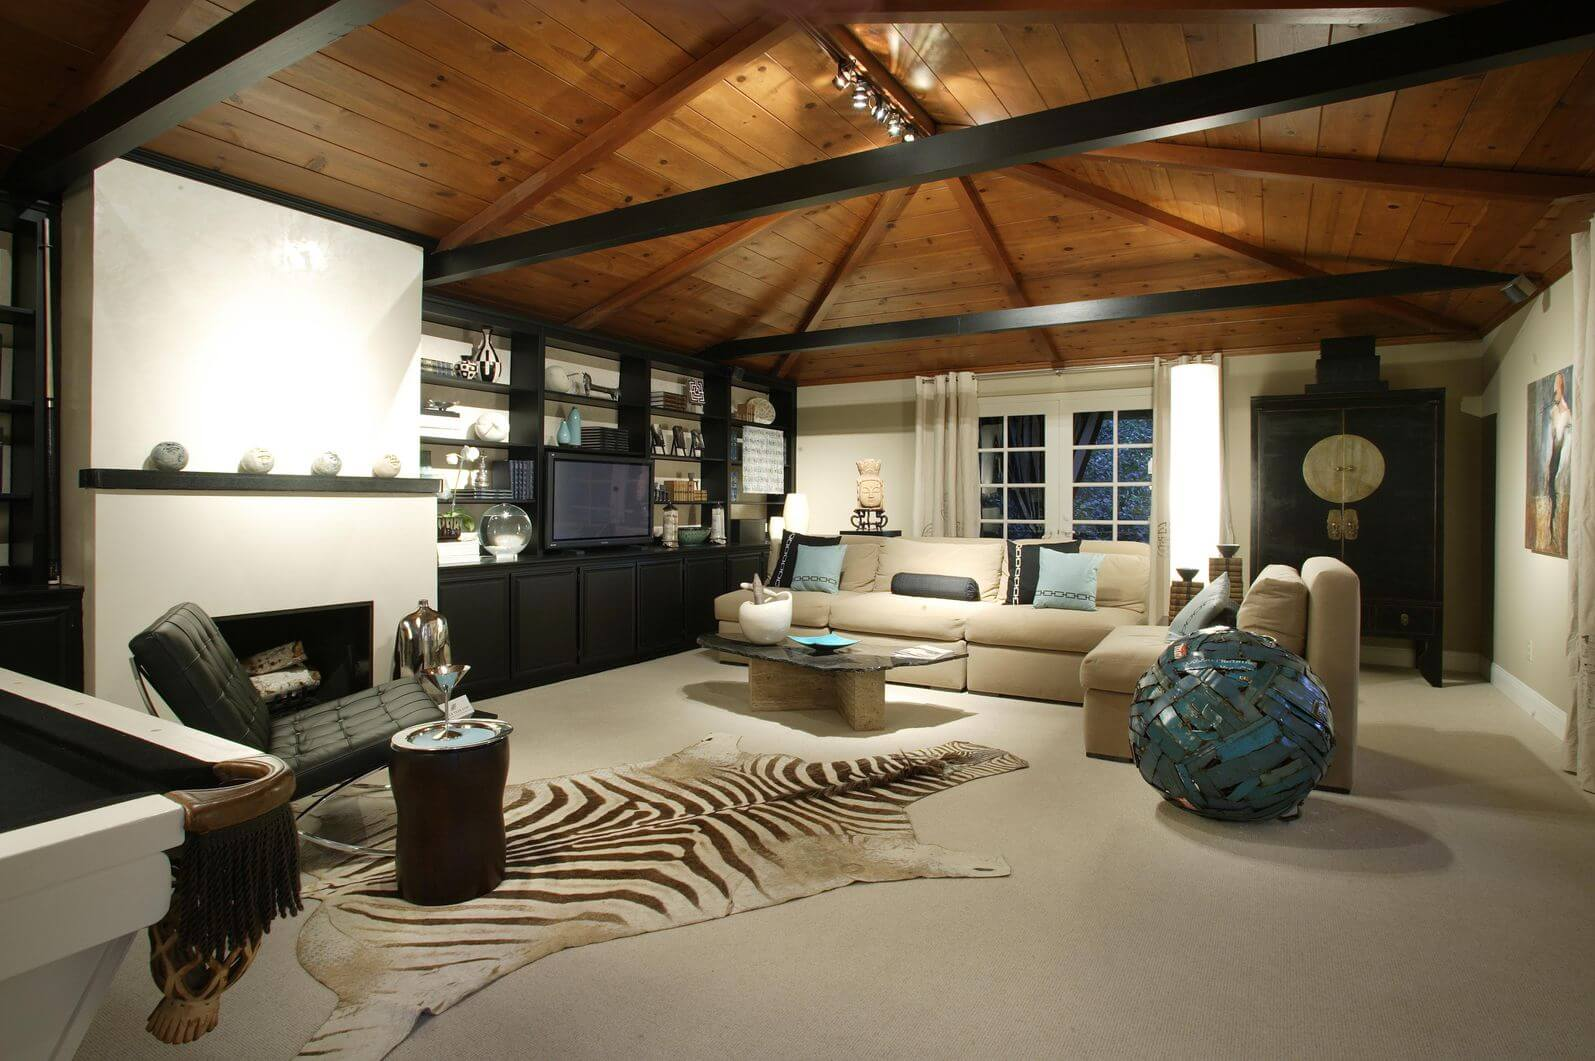 17 Zebra Living Room Decor Ideas (Pictures)